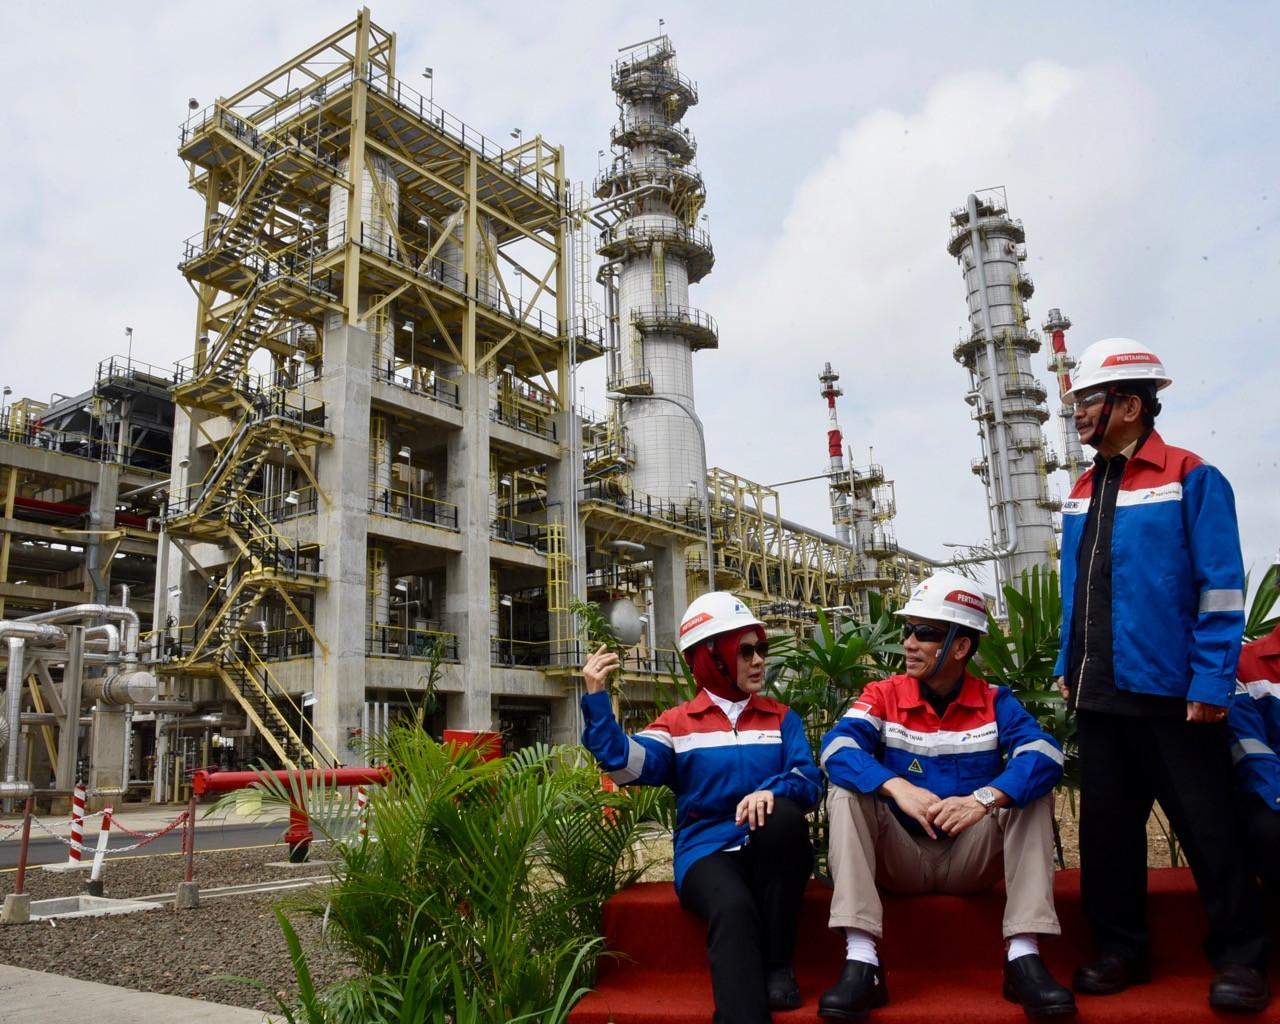 New Cilacap refinery to produce 60 percent more RON92 gasoline